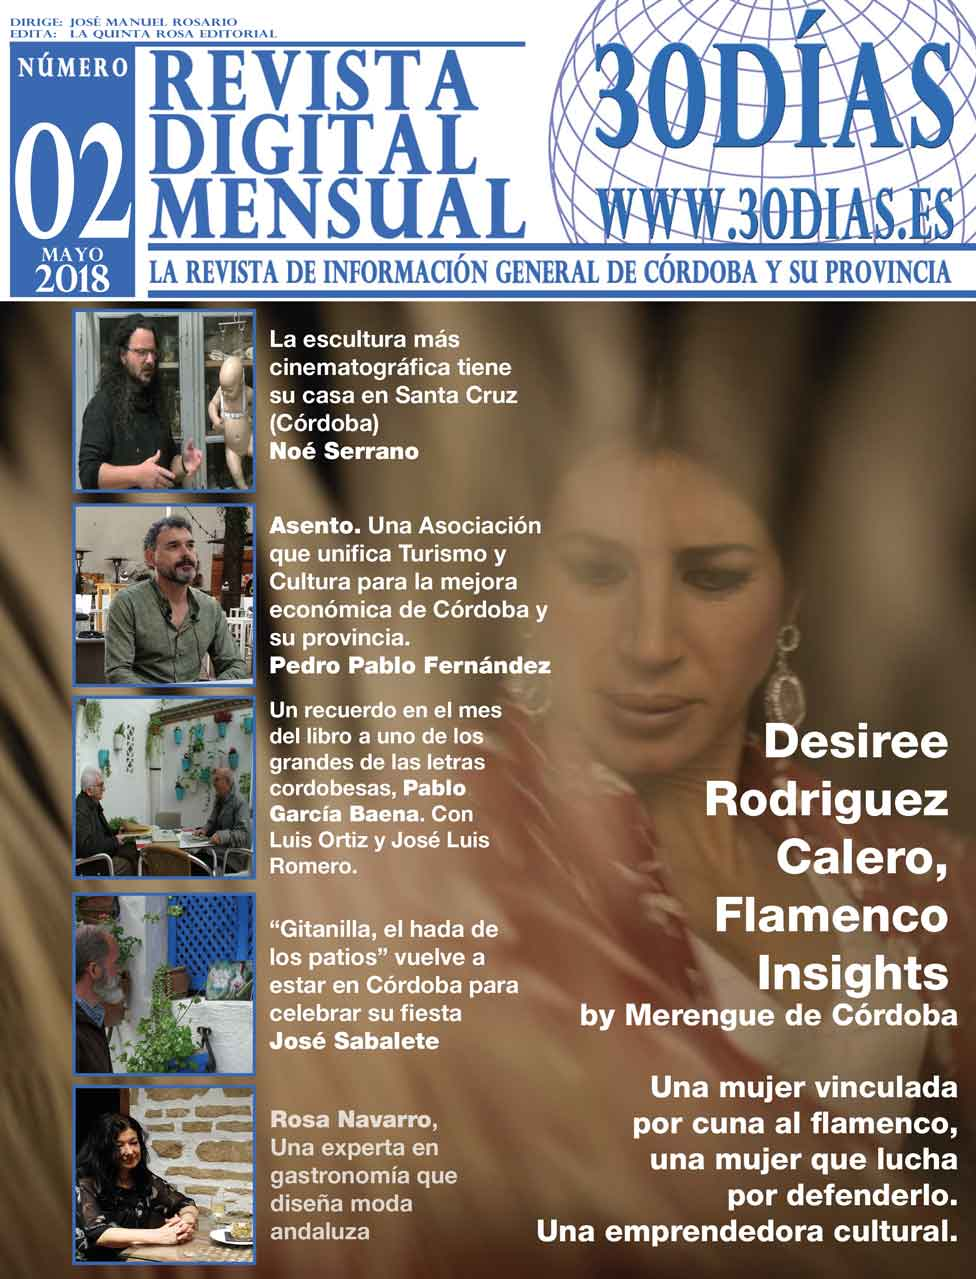 Revista02Portadaprovisional.jpg